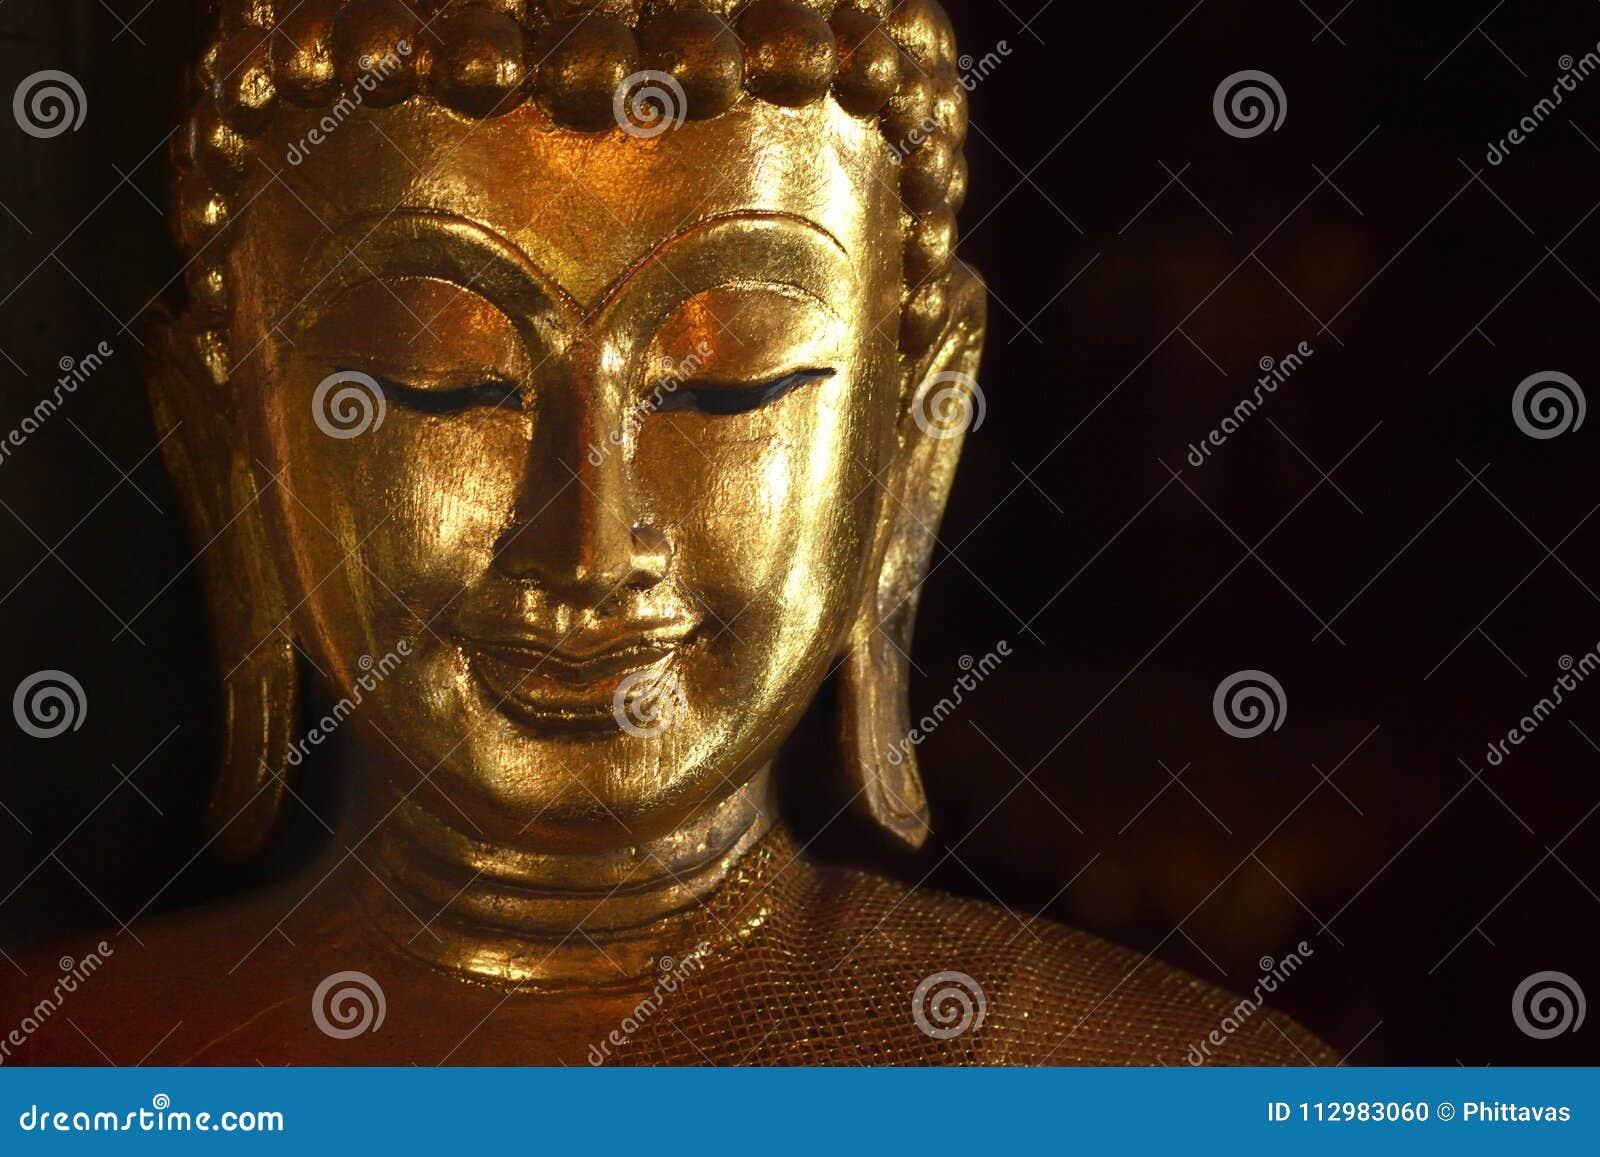 Golden face of buddish state in the art style ,Wat Krathum Suea Pla temple ,Bangkok